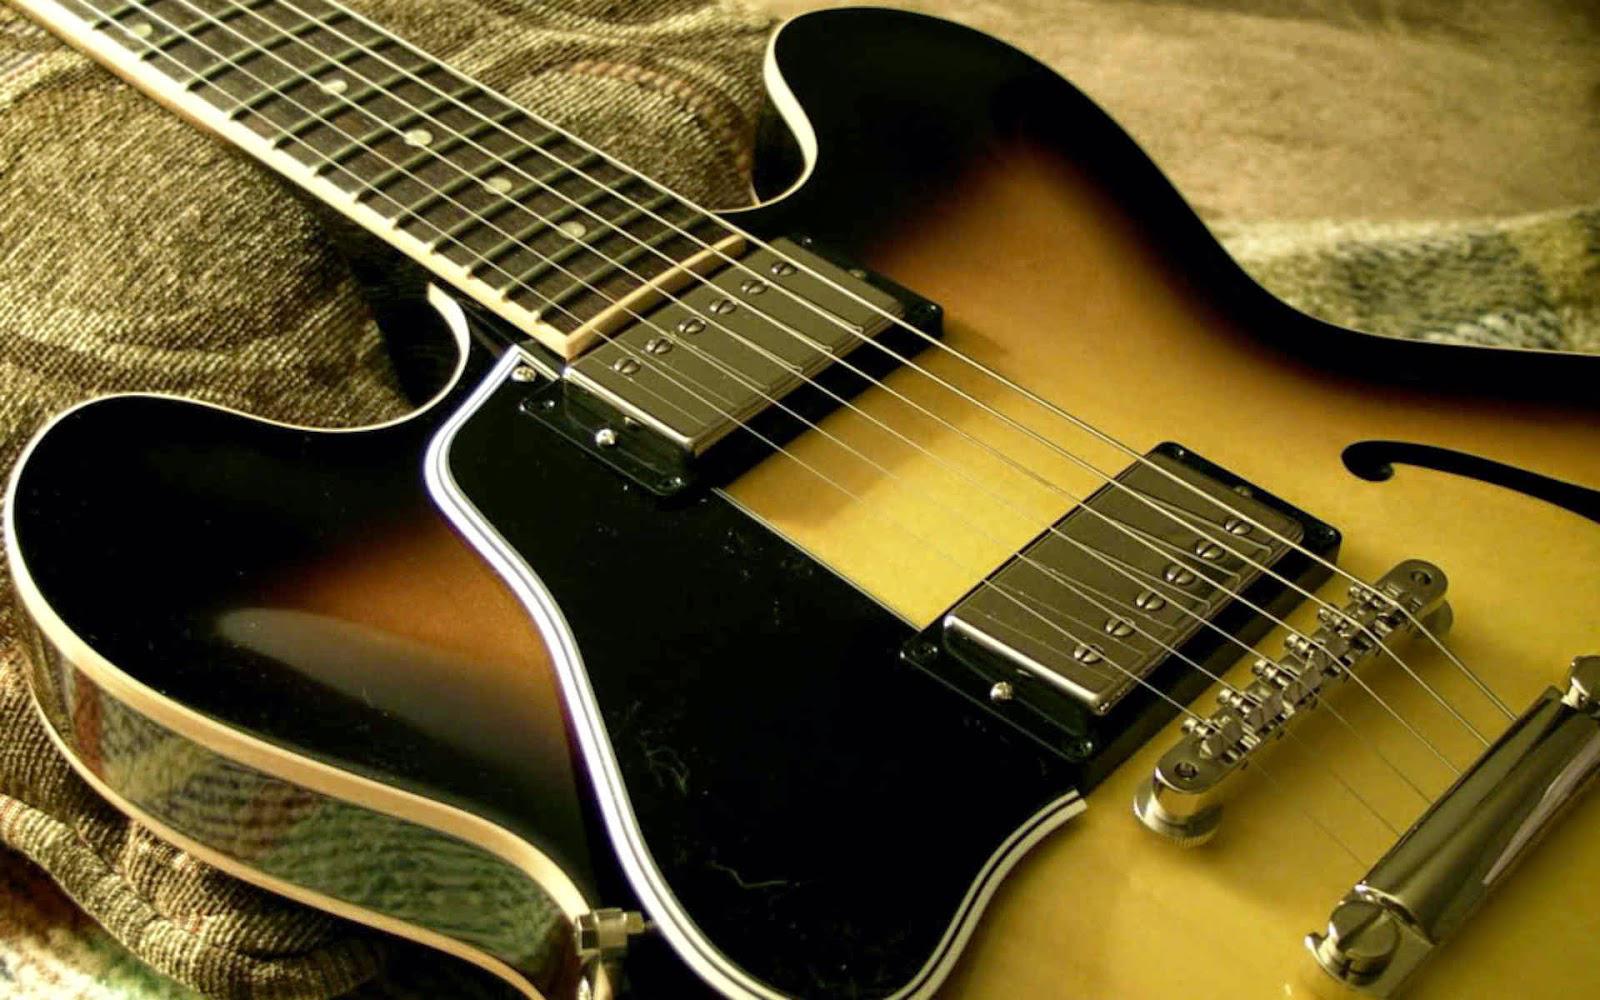 Epiphone Wallpapers: Acoustic Guitar Wallpaper HD